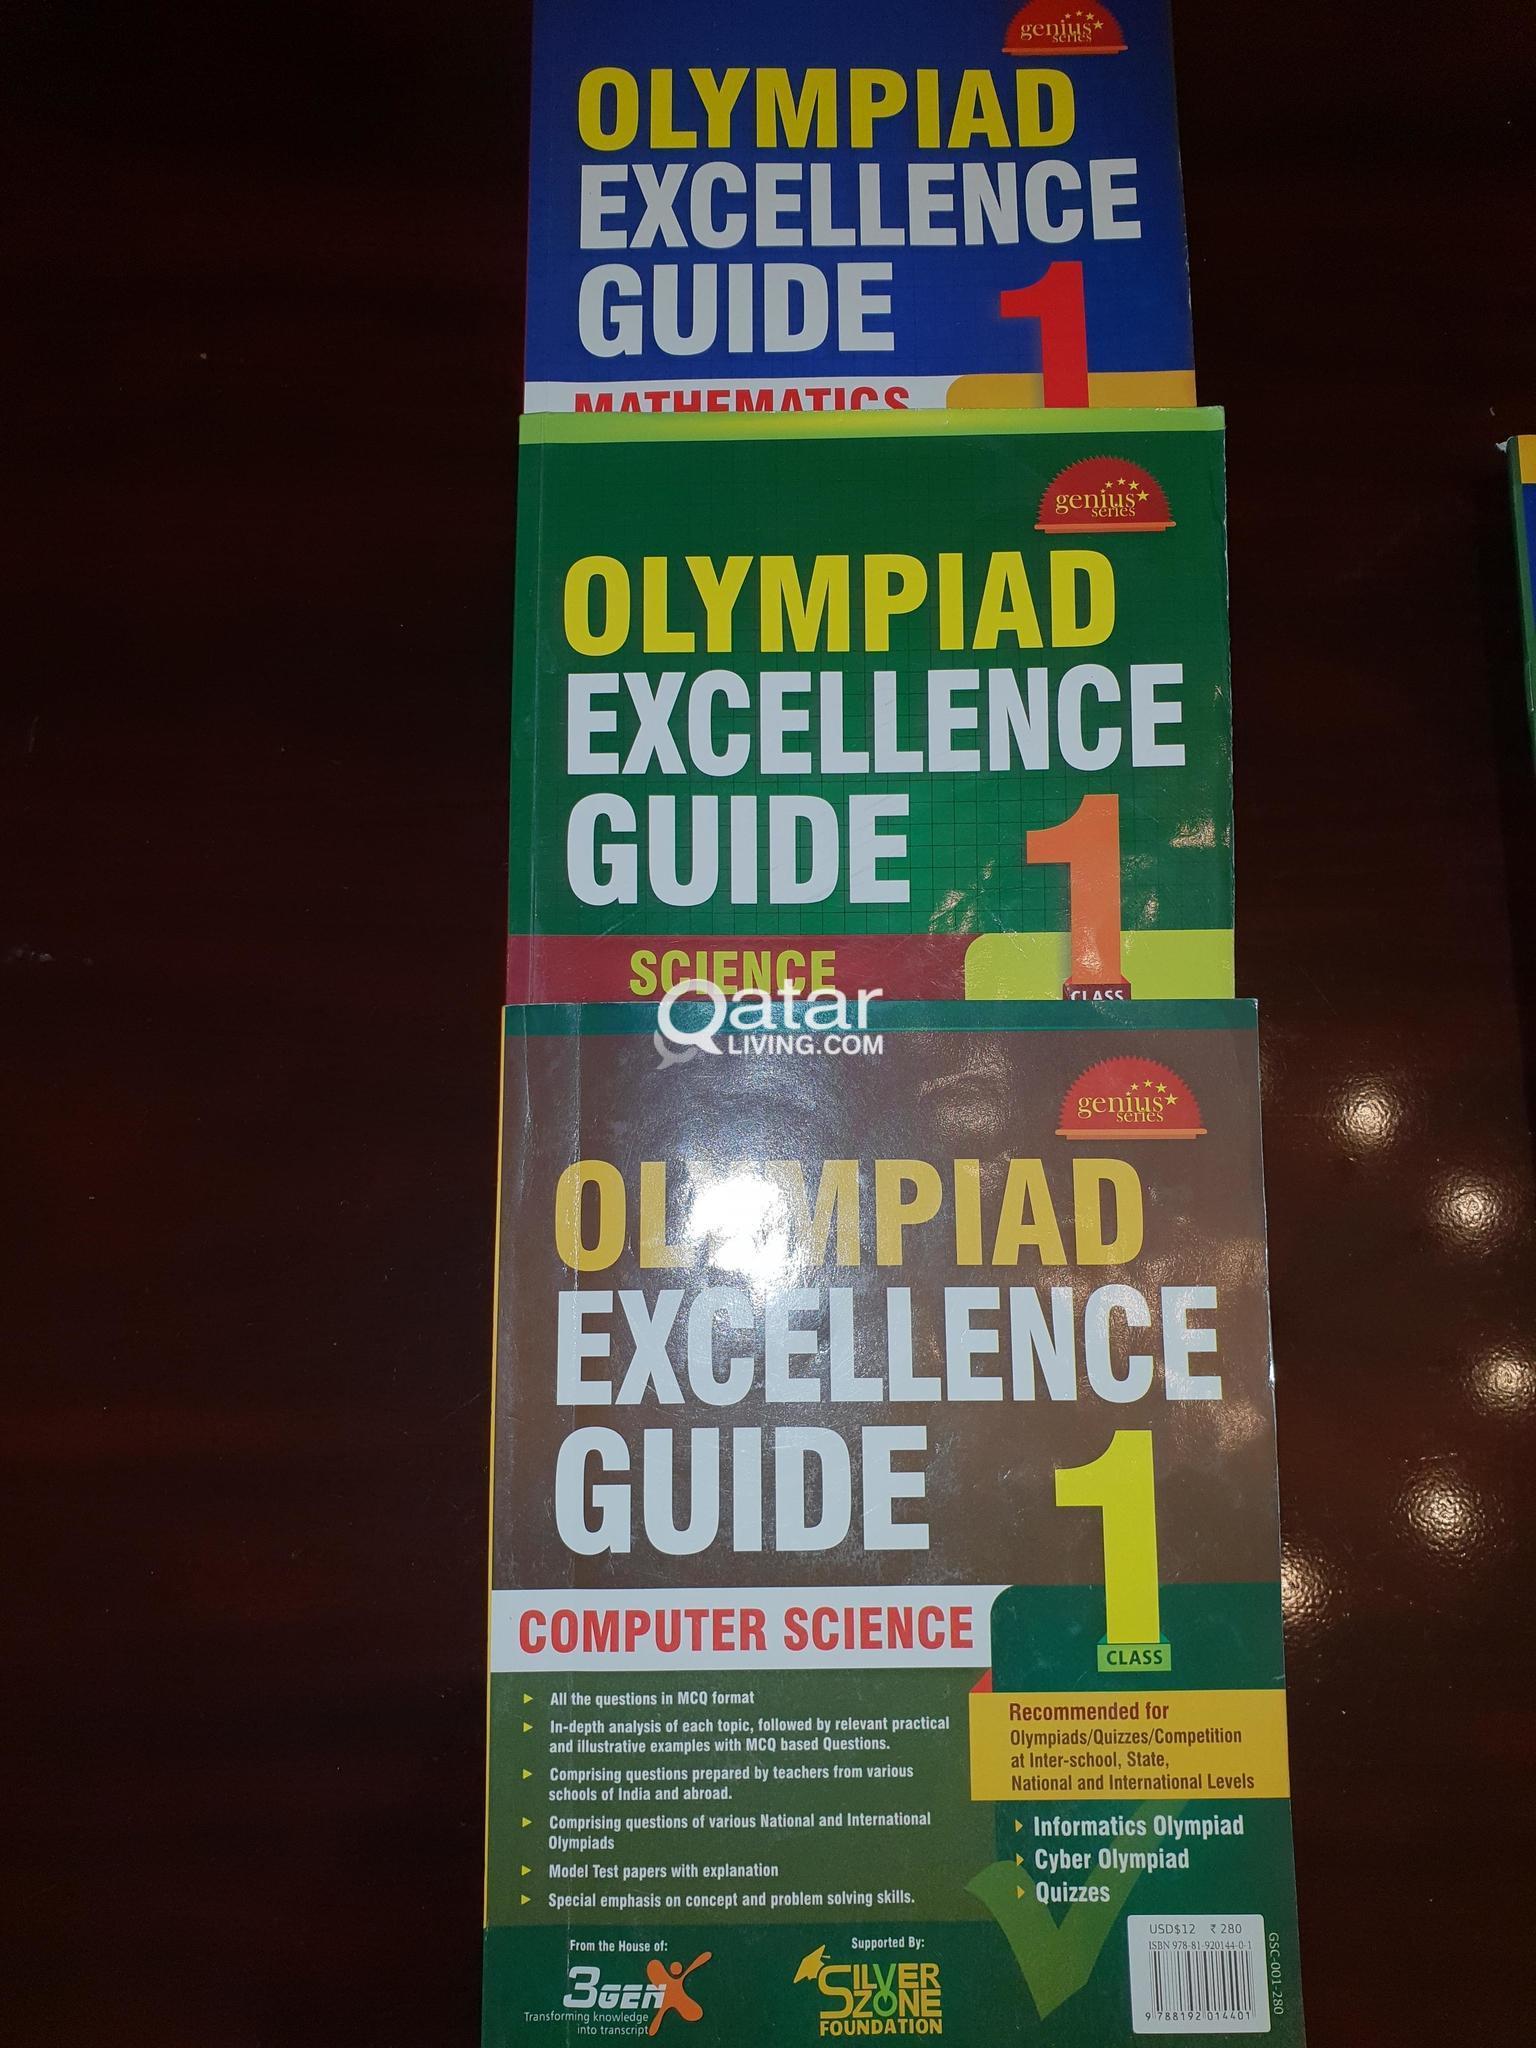 Carefully used Olympiad books (Class1) | Qatar Living